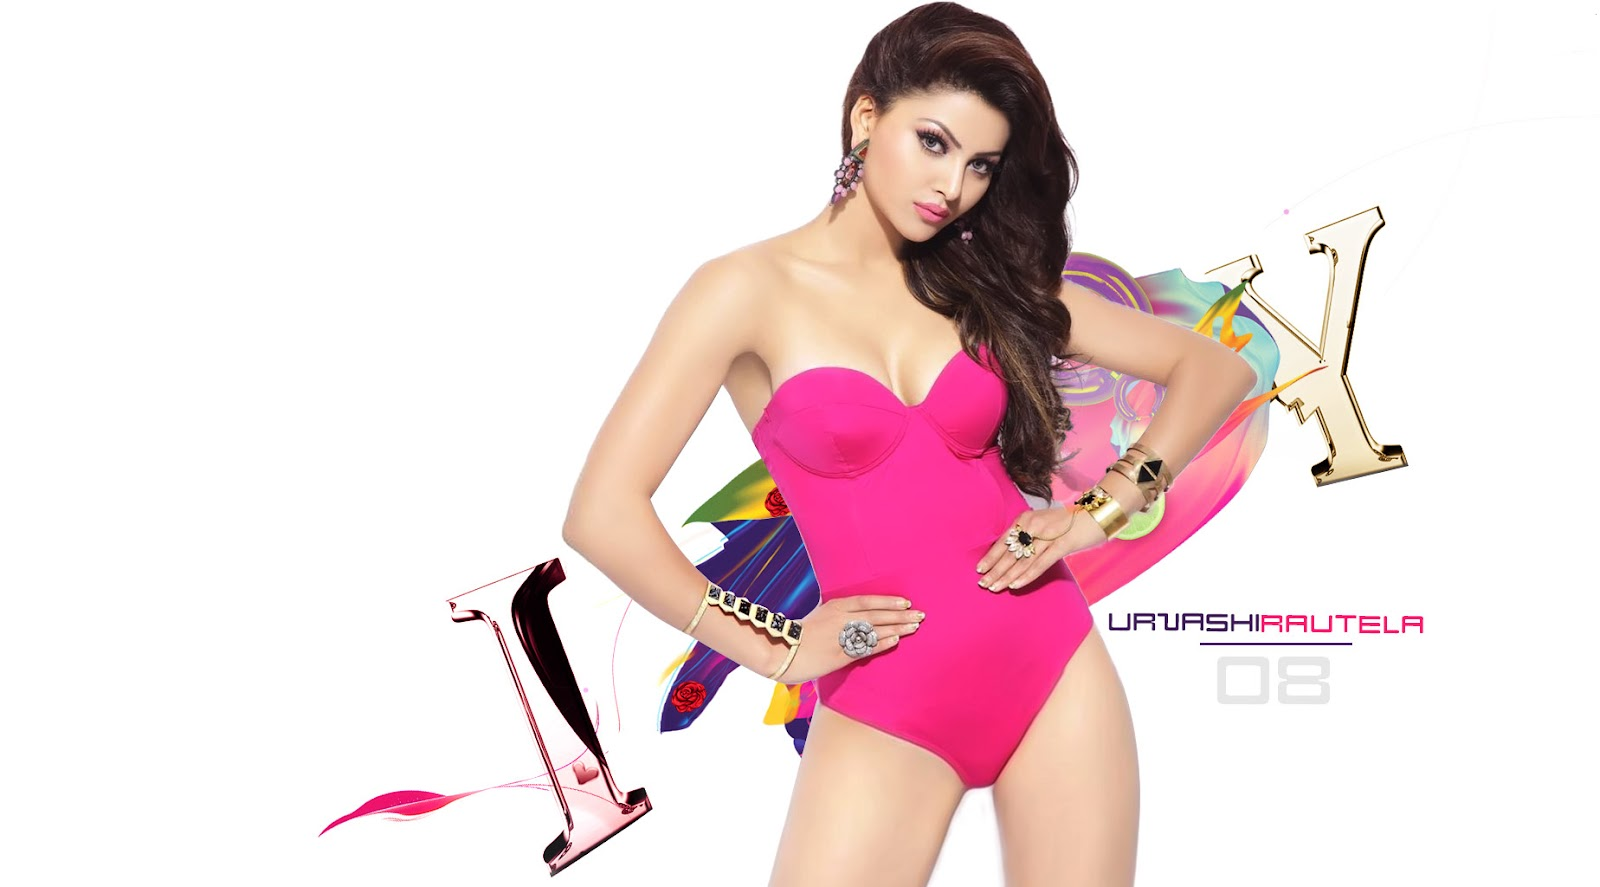 Urvashi Rautela Hot Bikini 1080p Hd Wallpaper Images